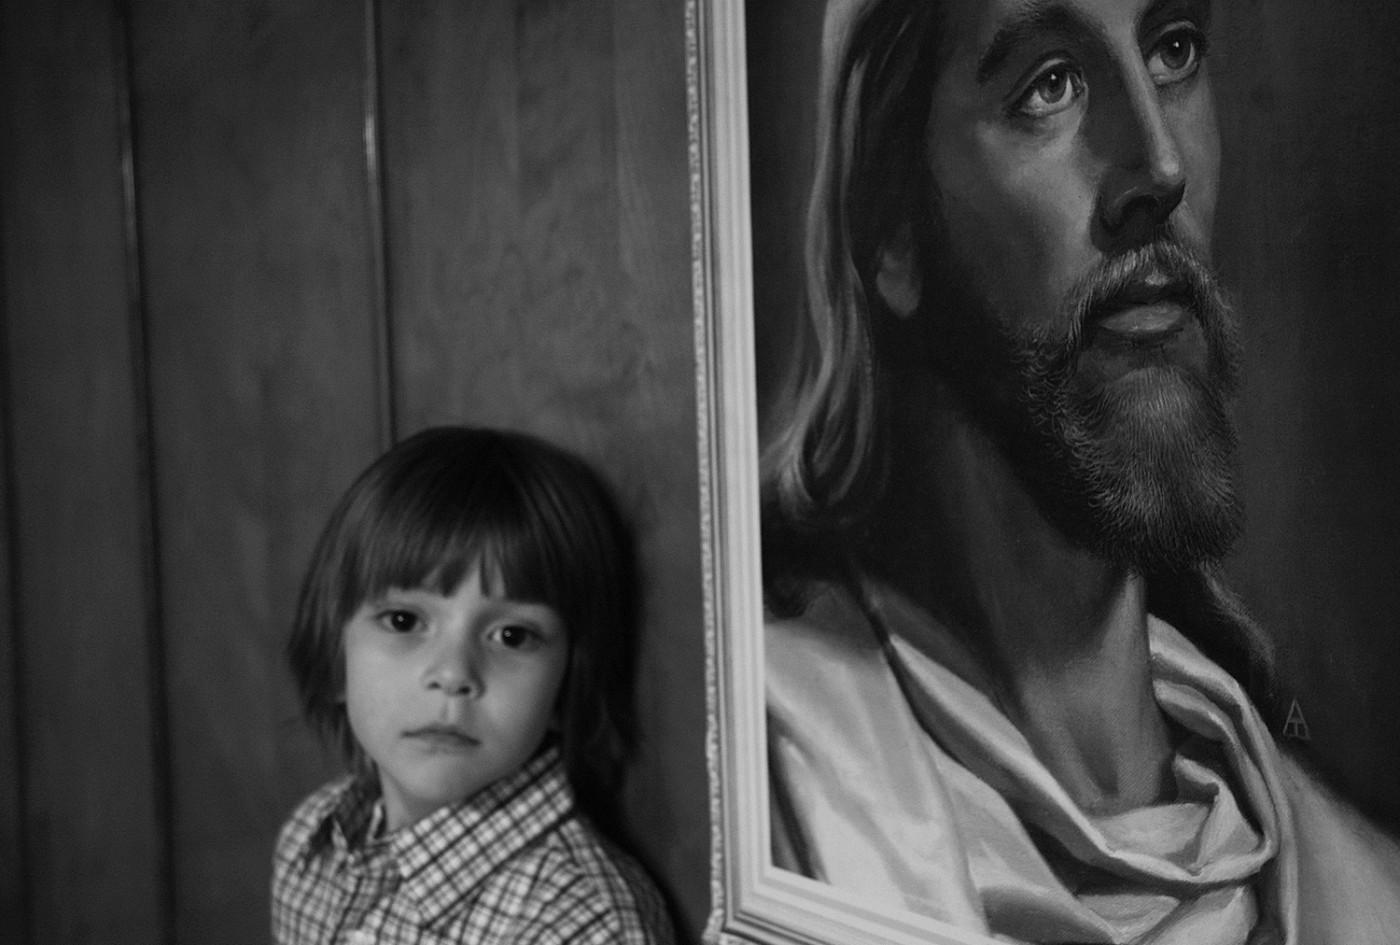 Christopher Manousos, </span><span><em>Jesus Kid, 2008</em>, </span><span>12 X 15, C-Print